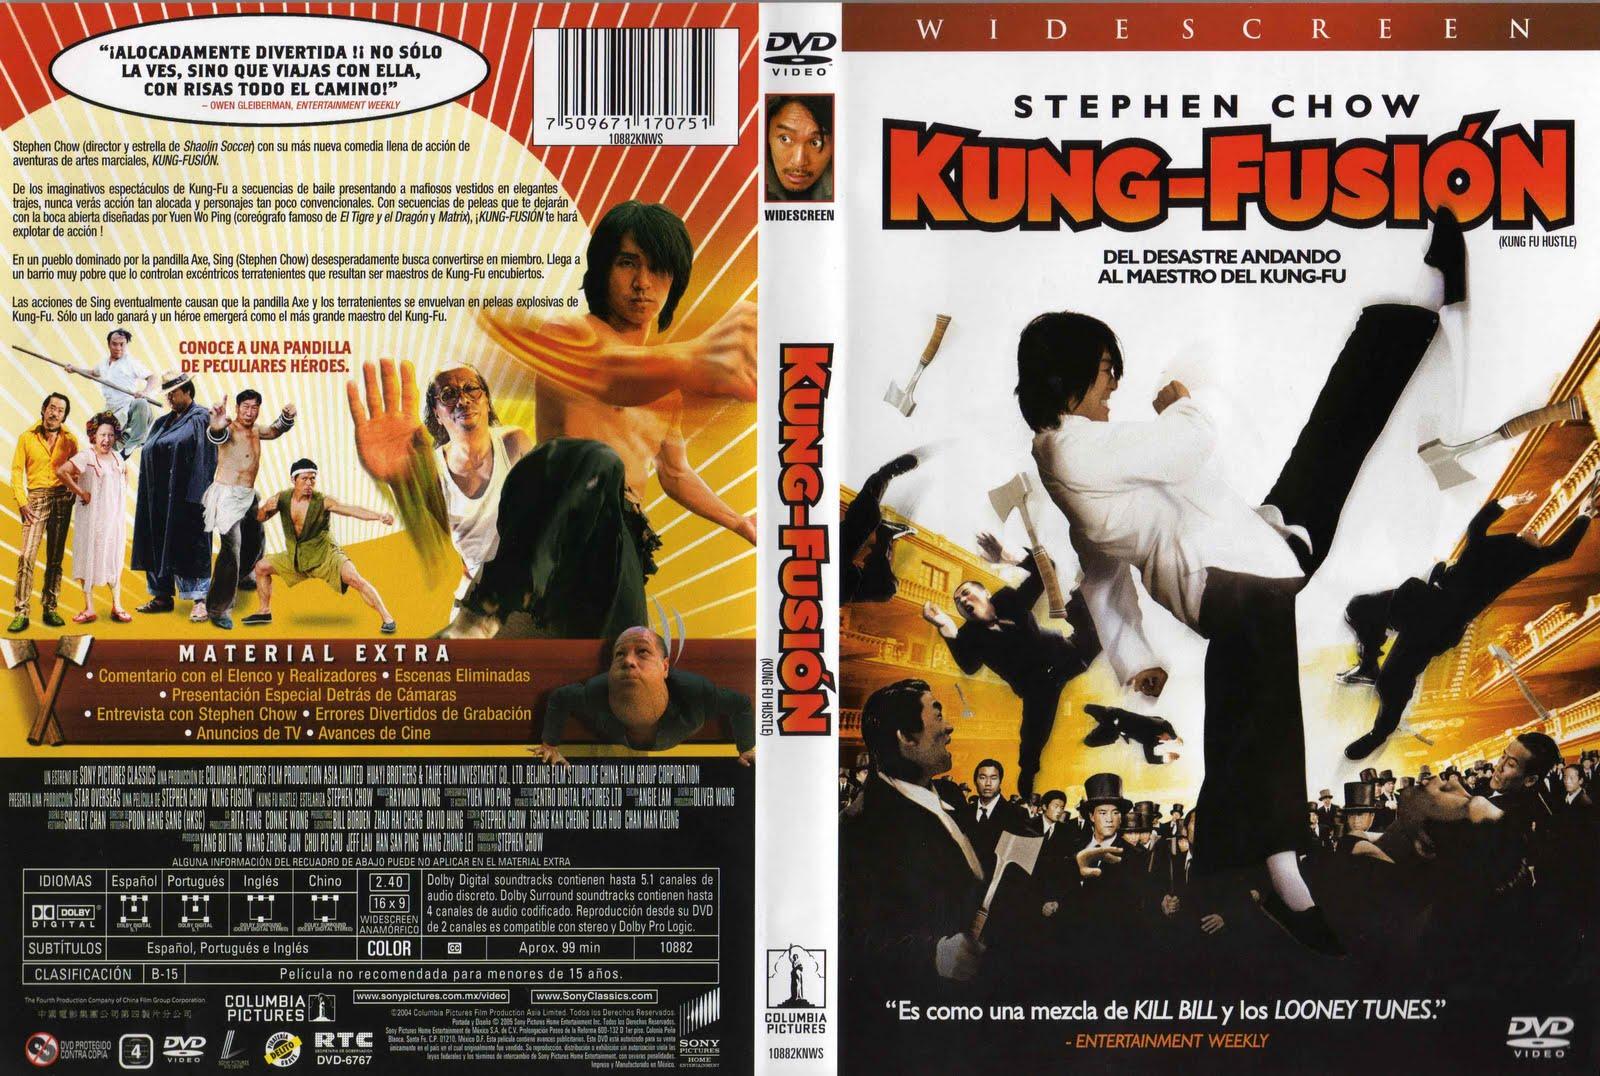 Kung-Fusión (2004) [Dvdrip Latino] [Zippyshare]